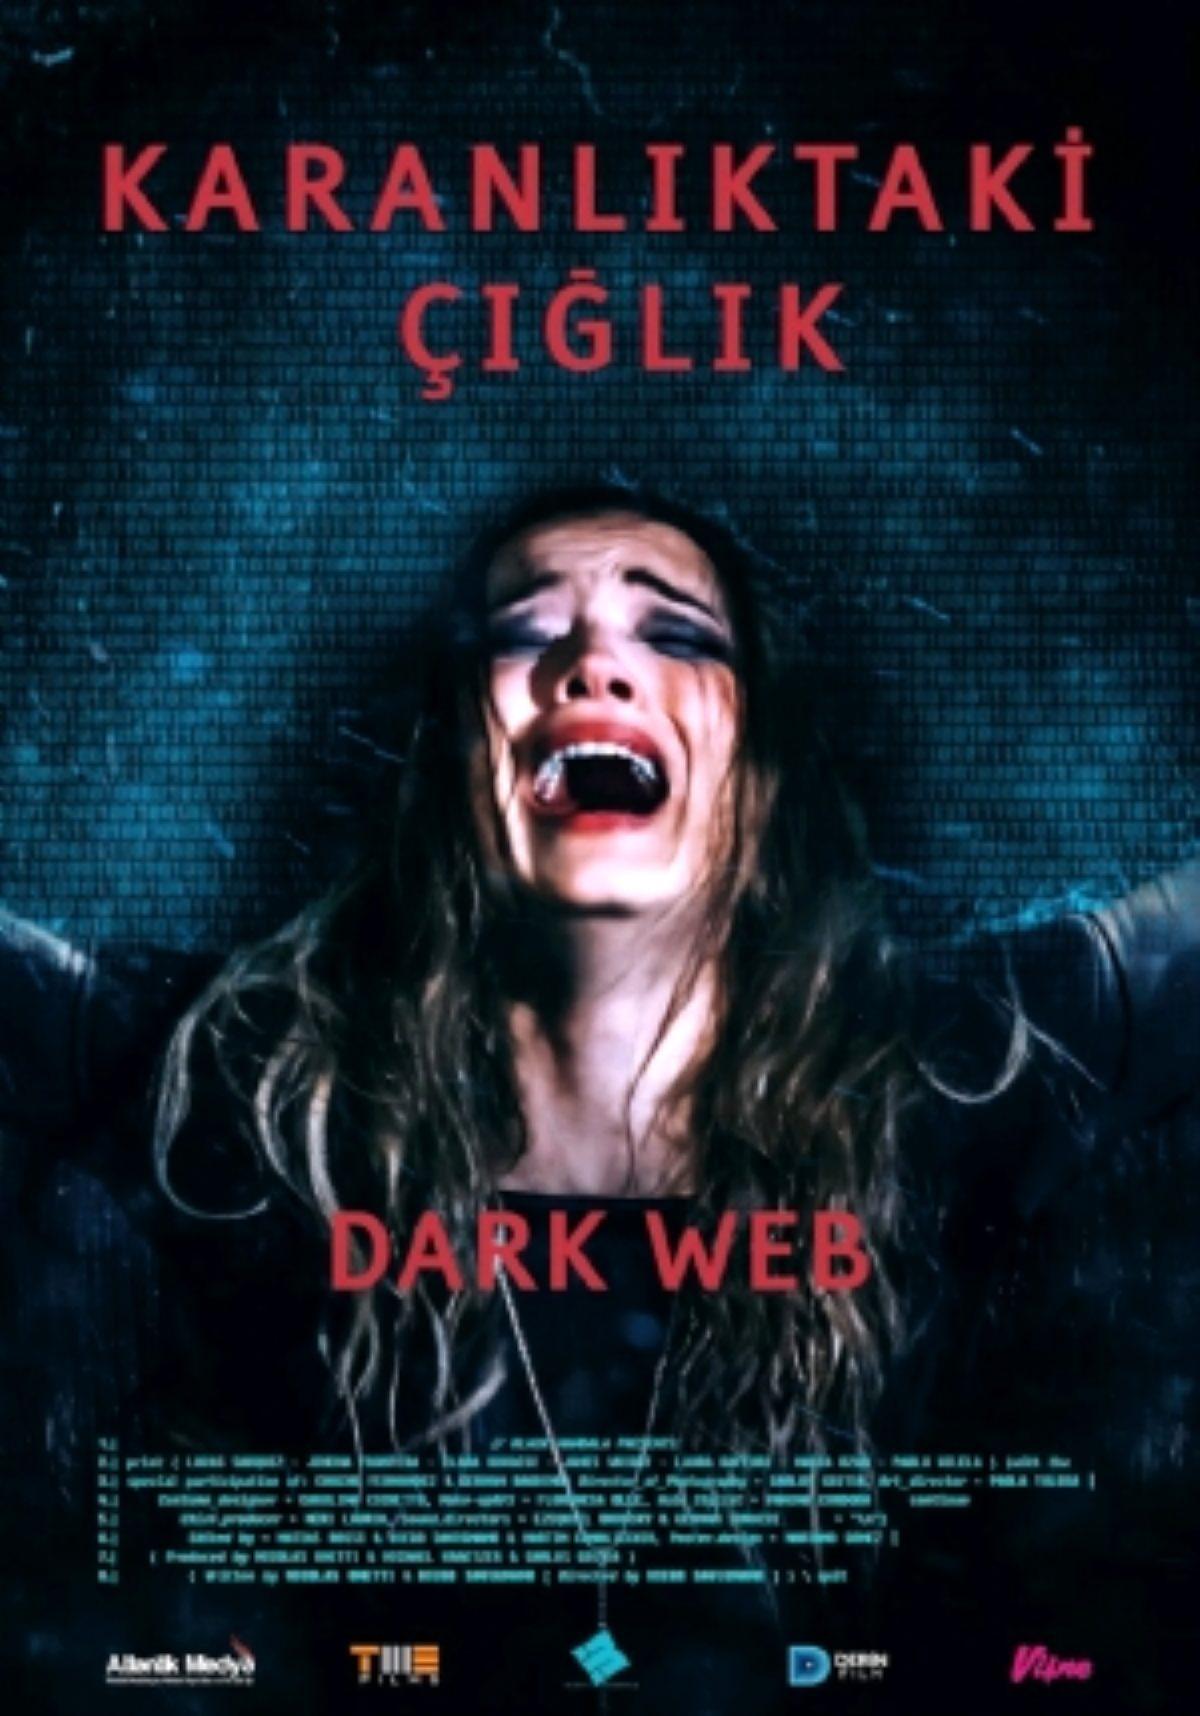 karanliktaki-ciglik-filmi-14383943_amp